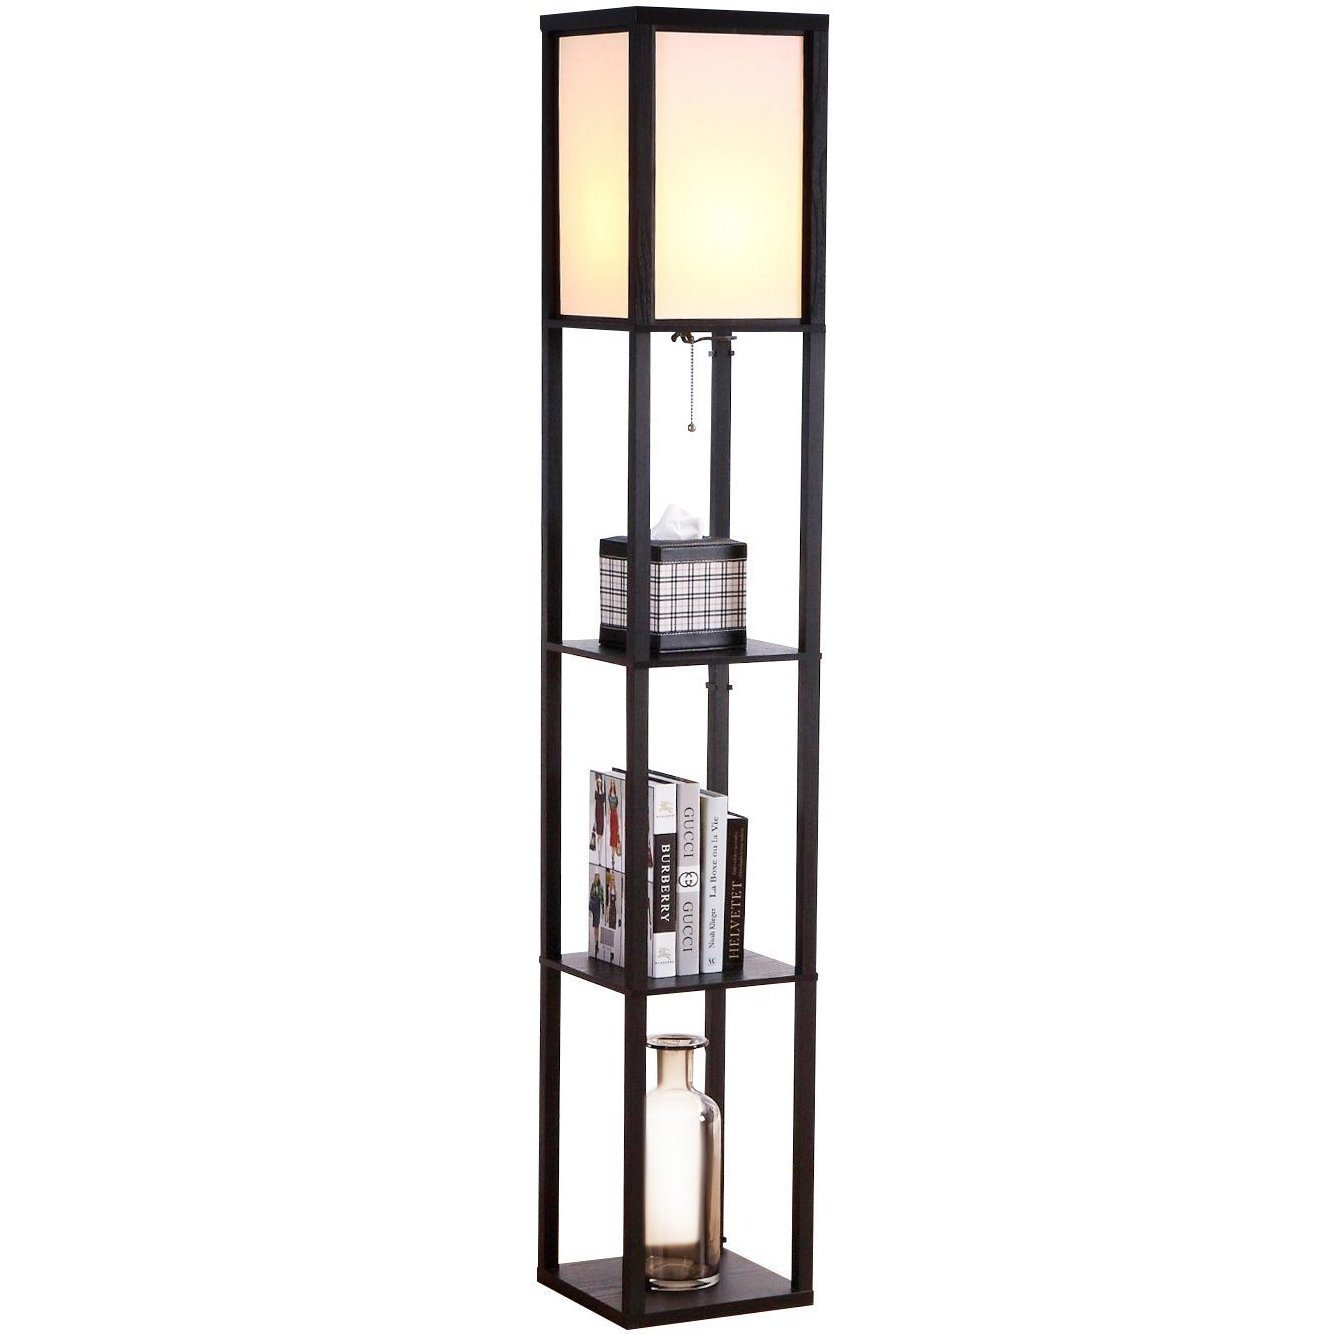 Maxwell LED Shelf Floor Lamp